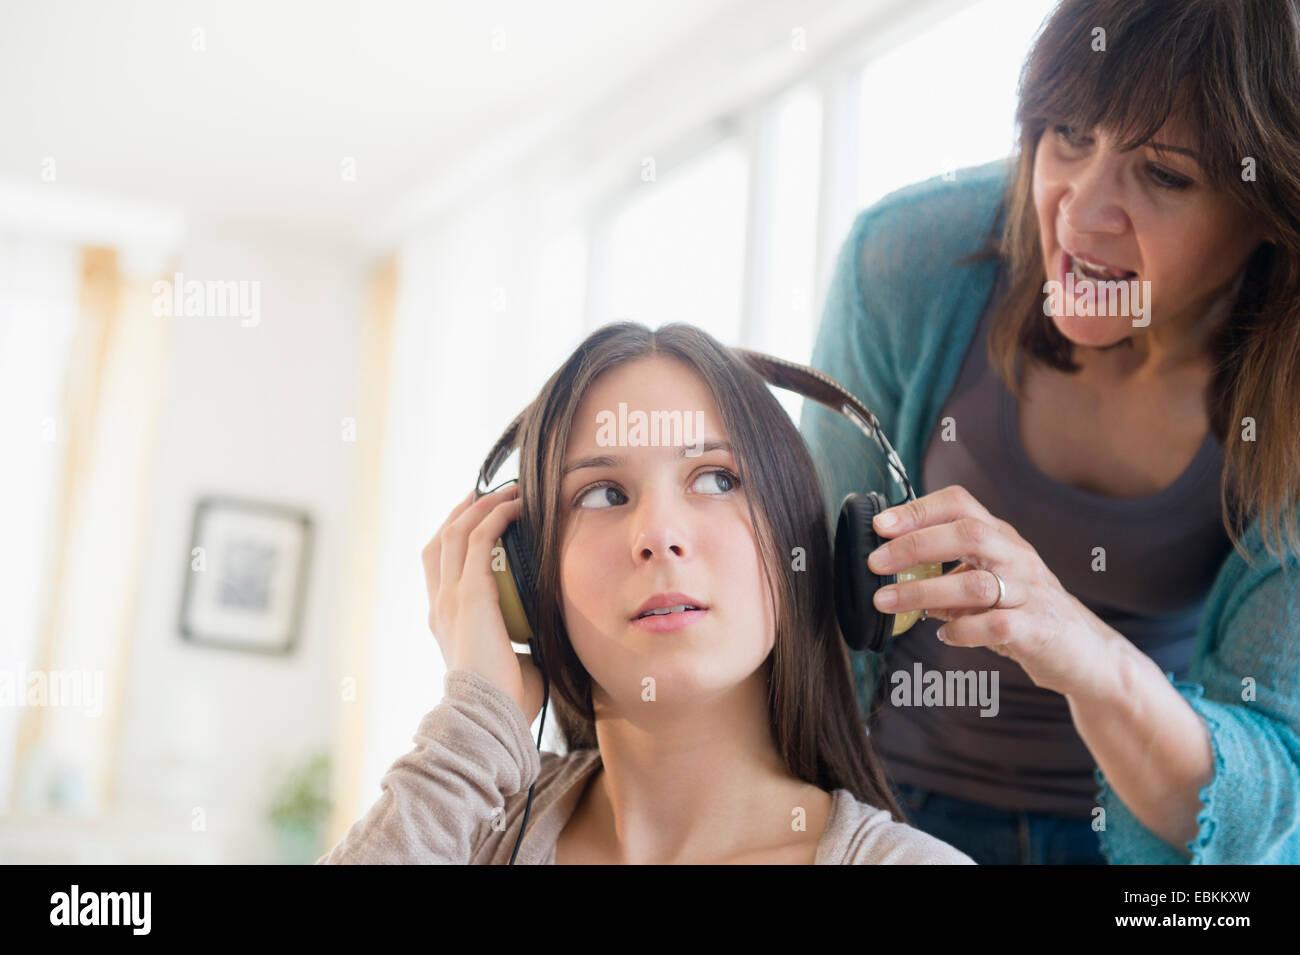 Maman crier après fille adolescente (14-15) Photo Stock